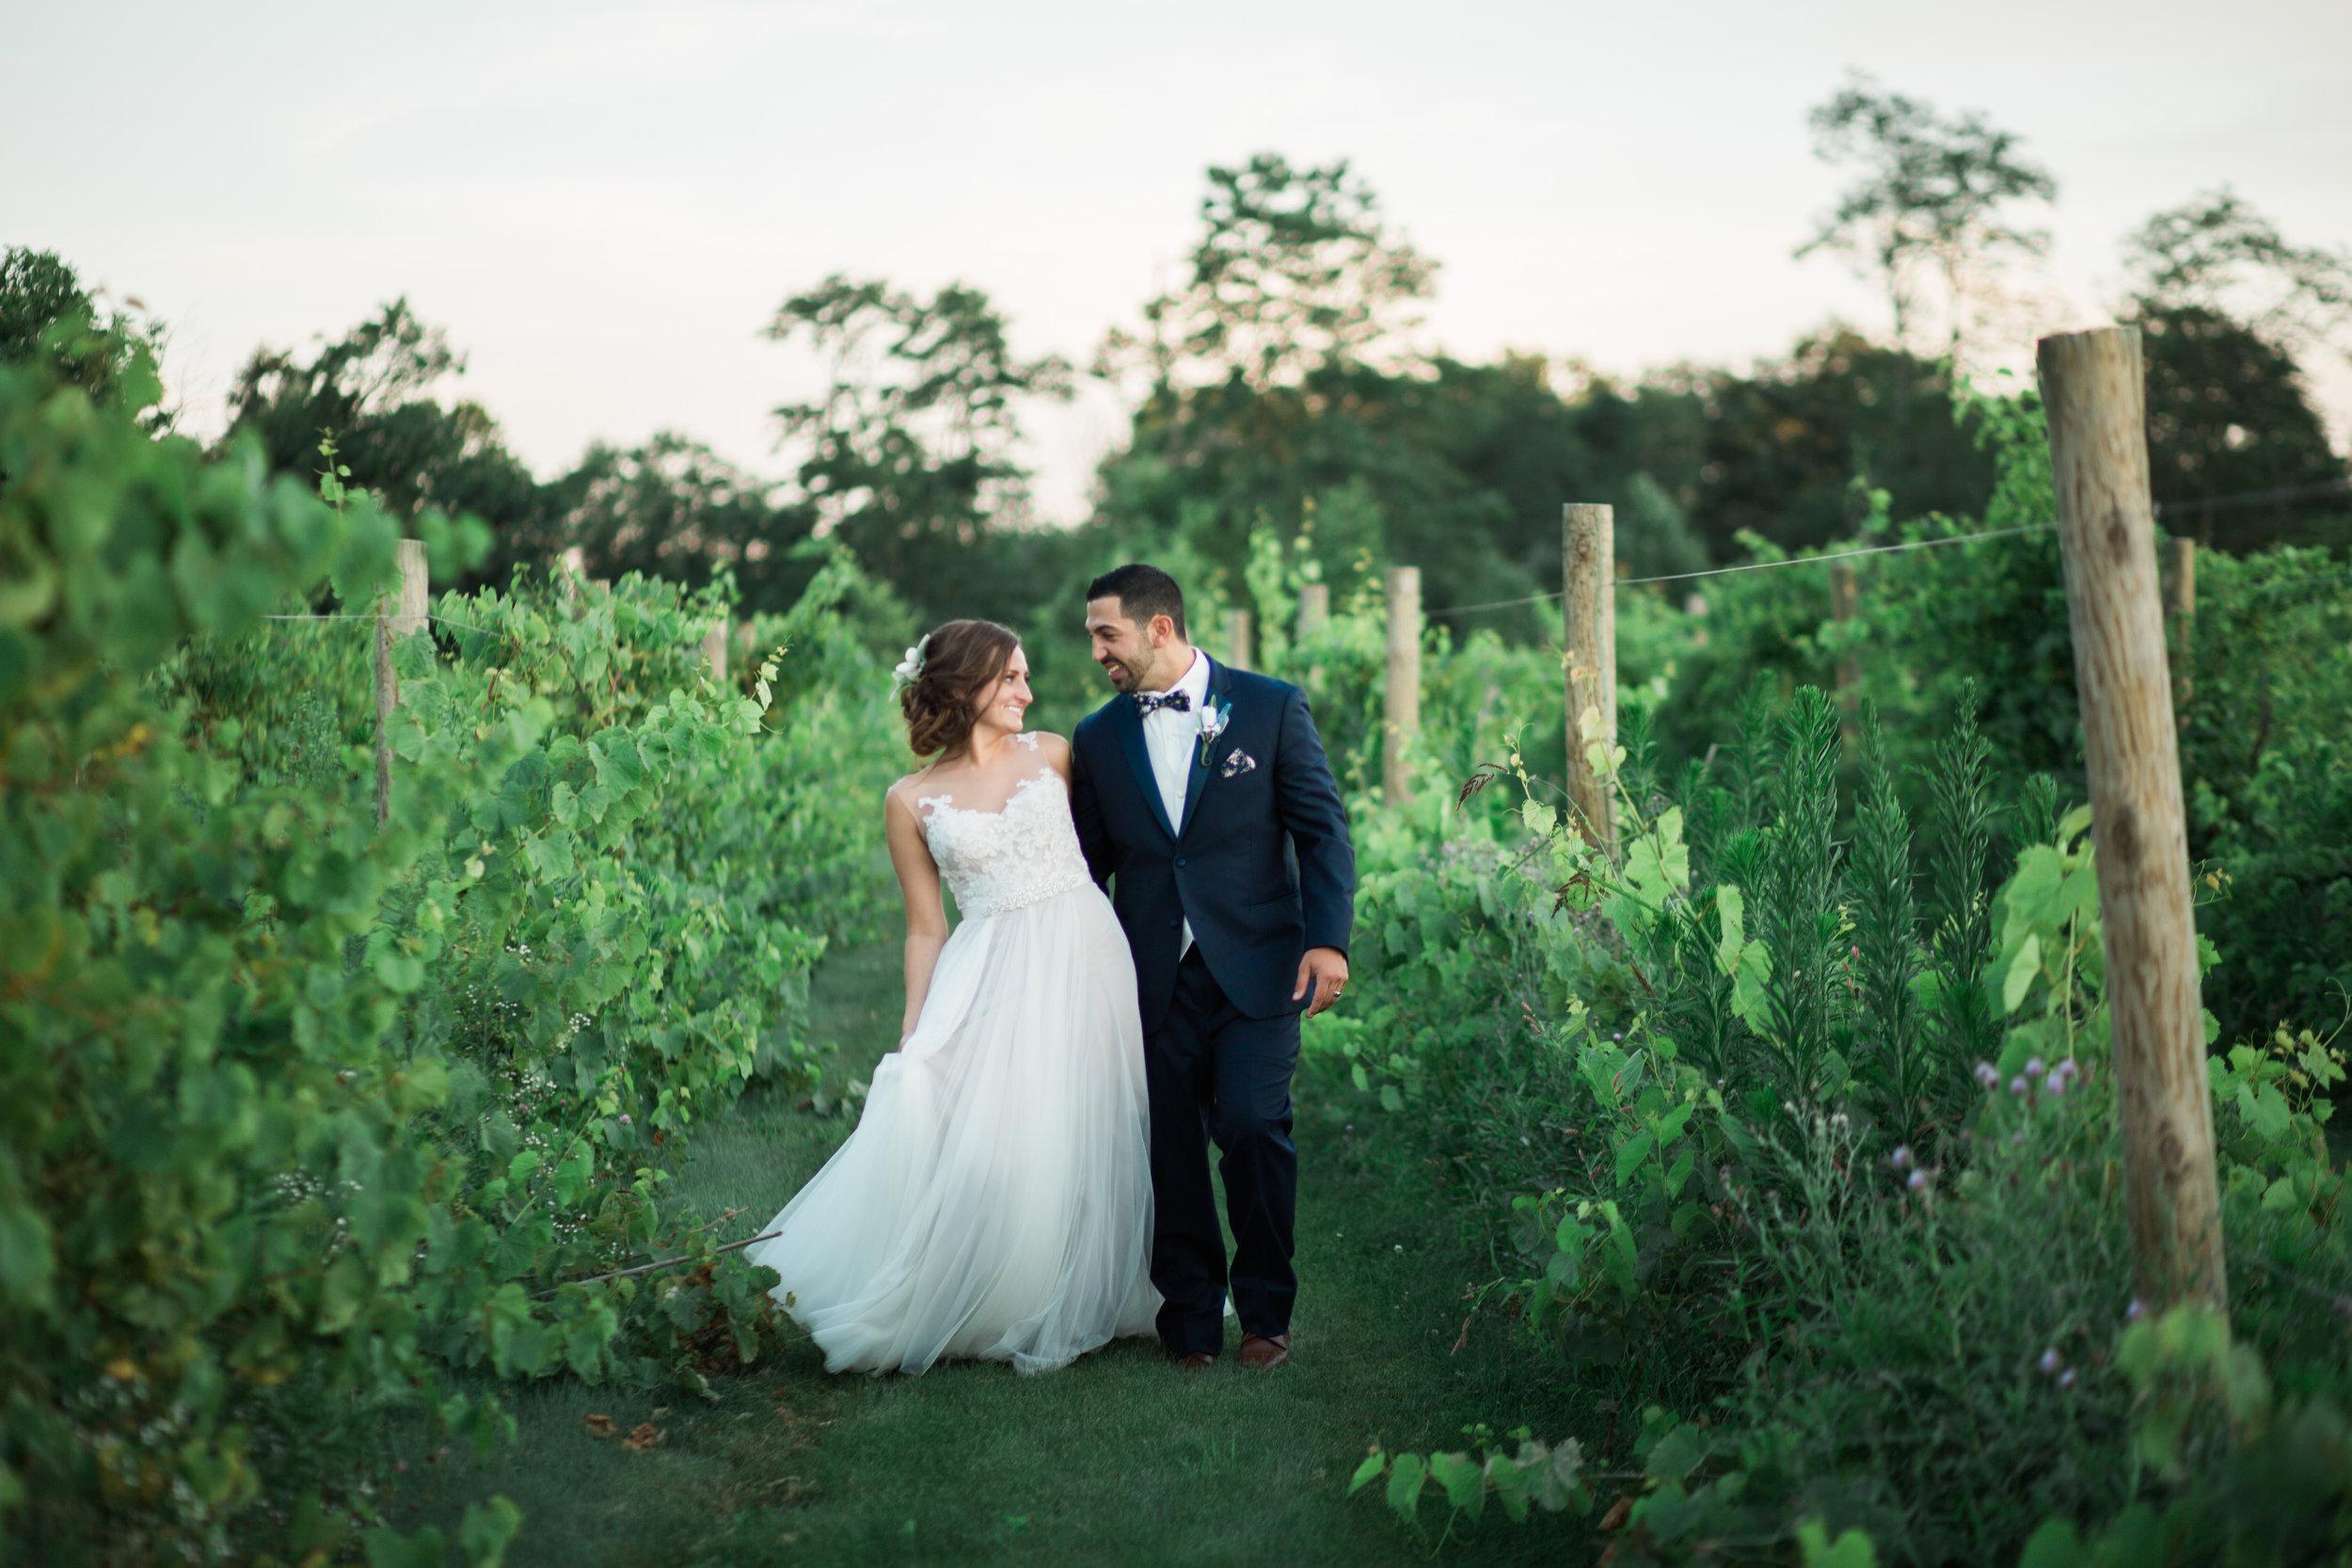 nick-and-martina-pine-lake-vineyards-columbiana-ohio-tracylynn-photography